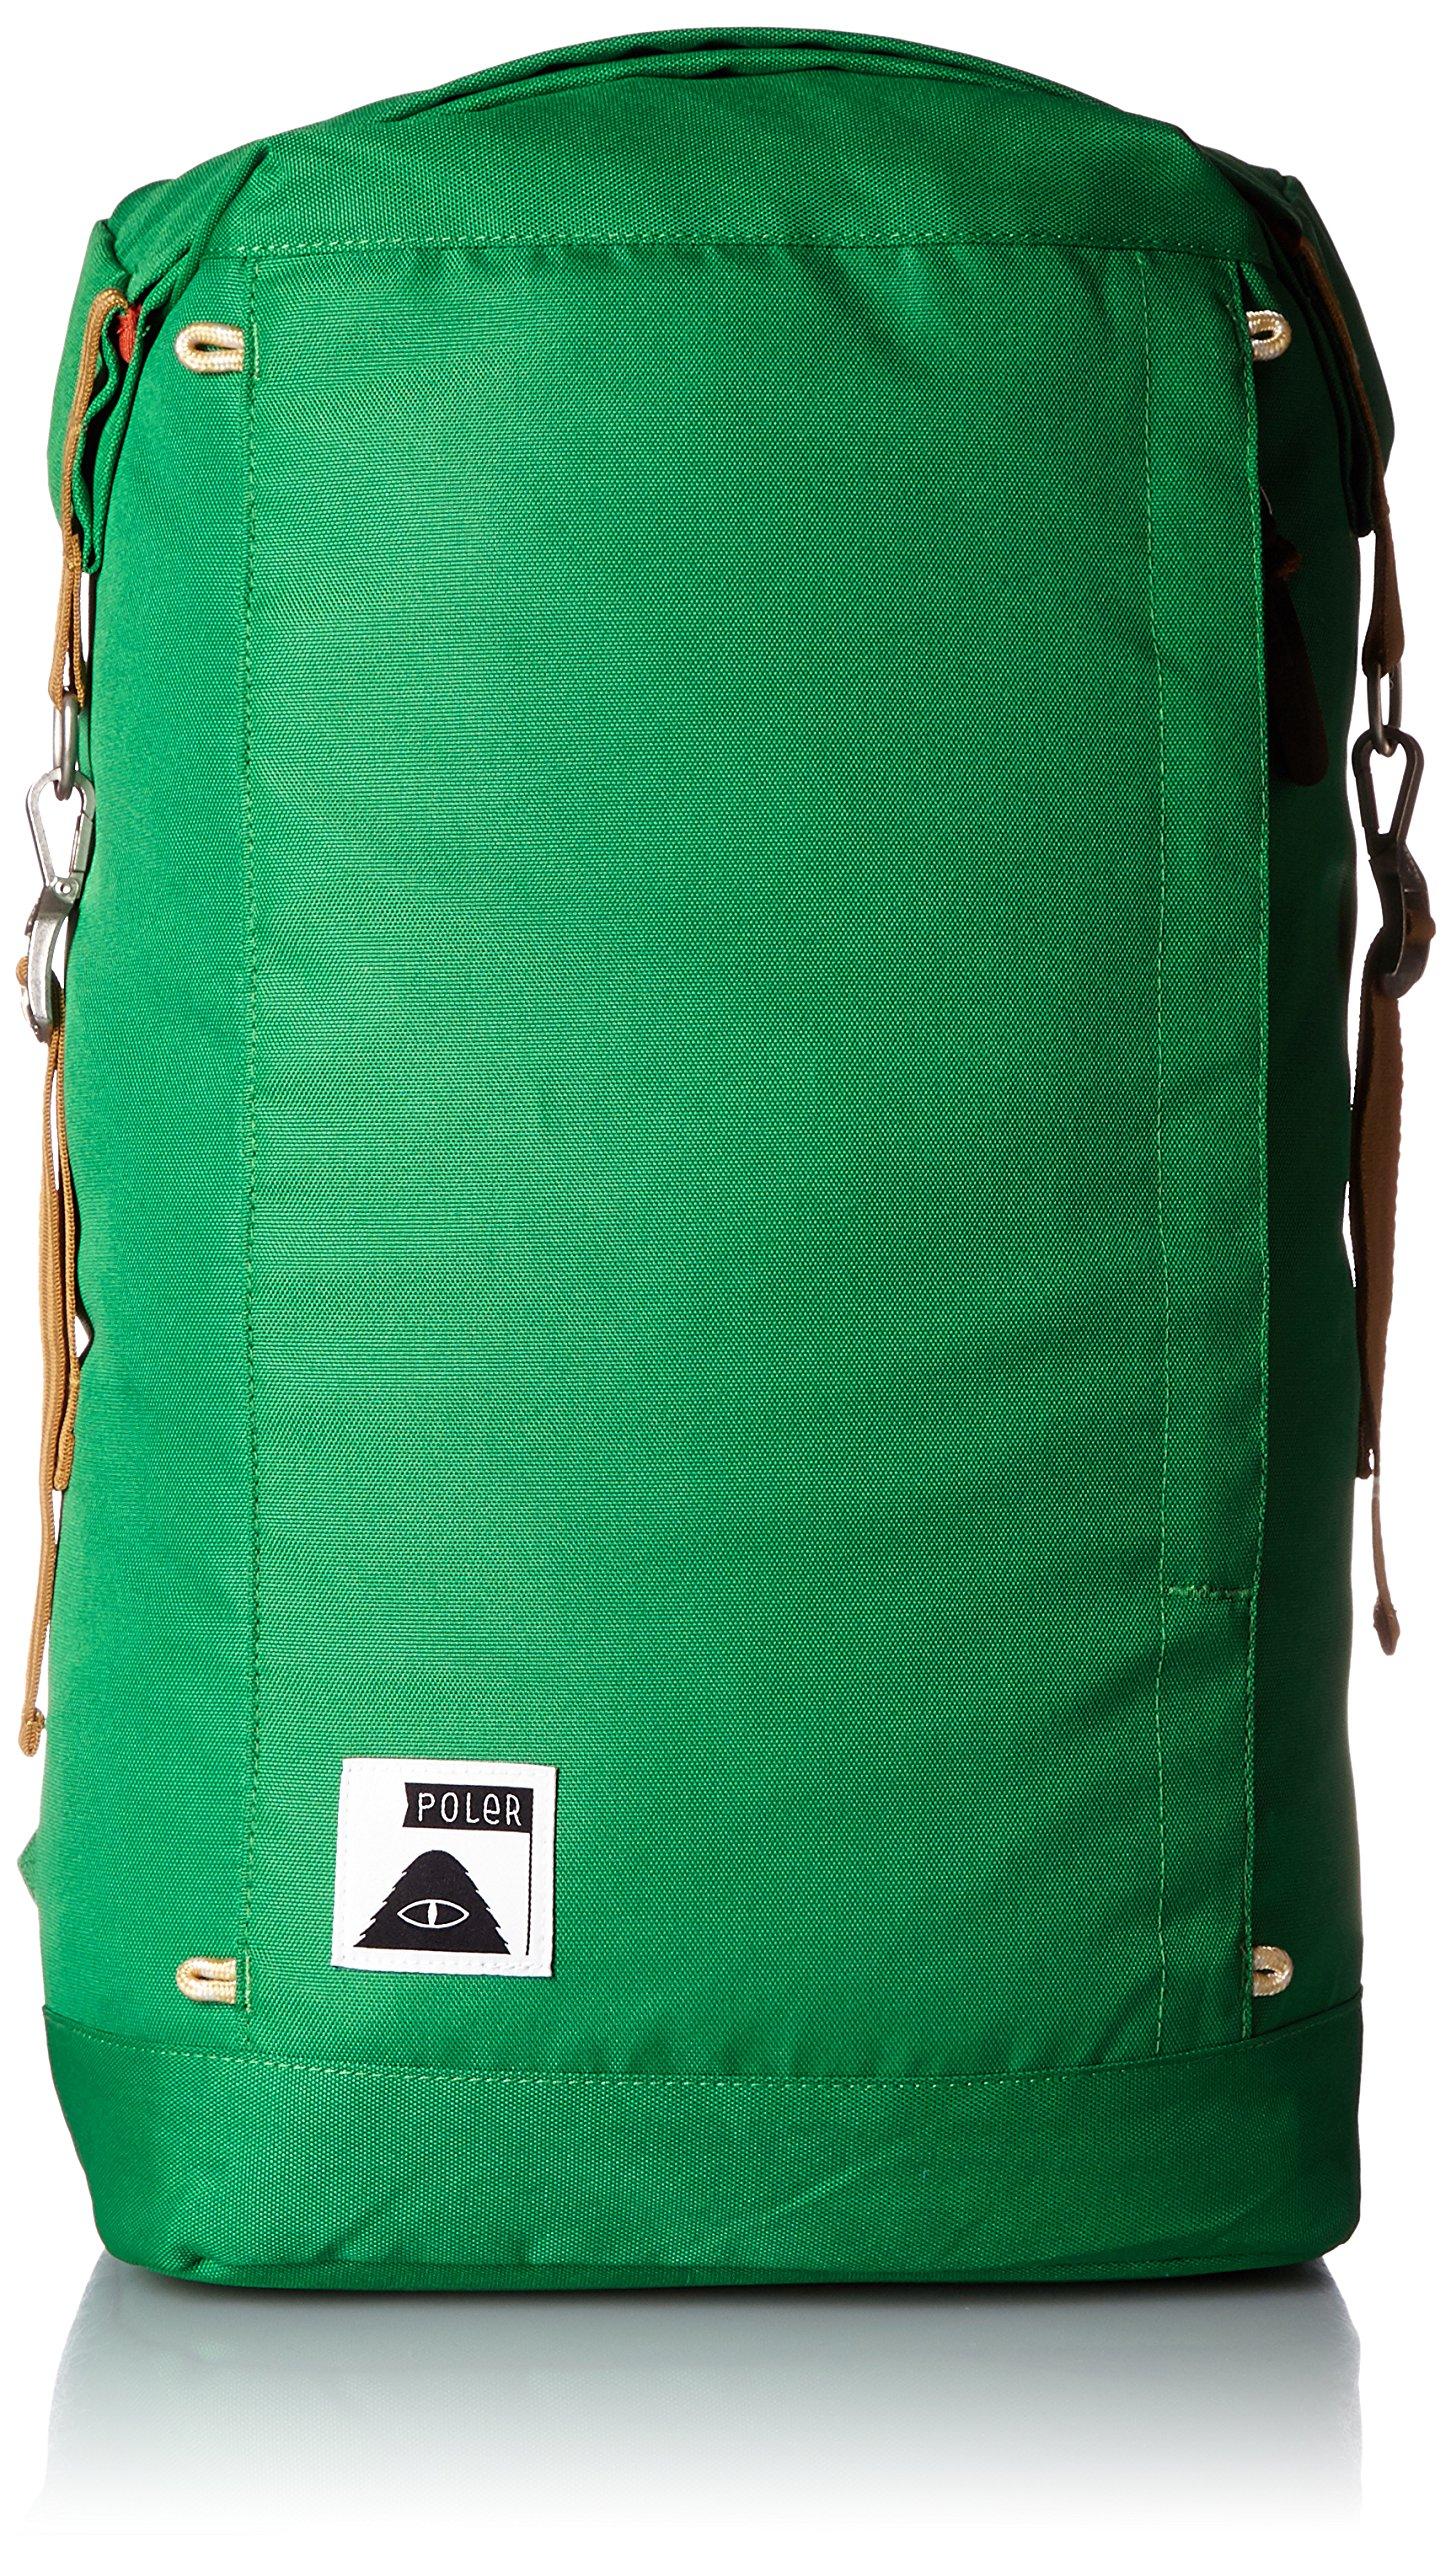 Poler Men's Rolltop Backpack, Bright Green, One Size